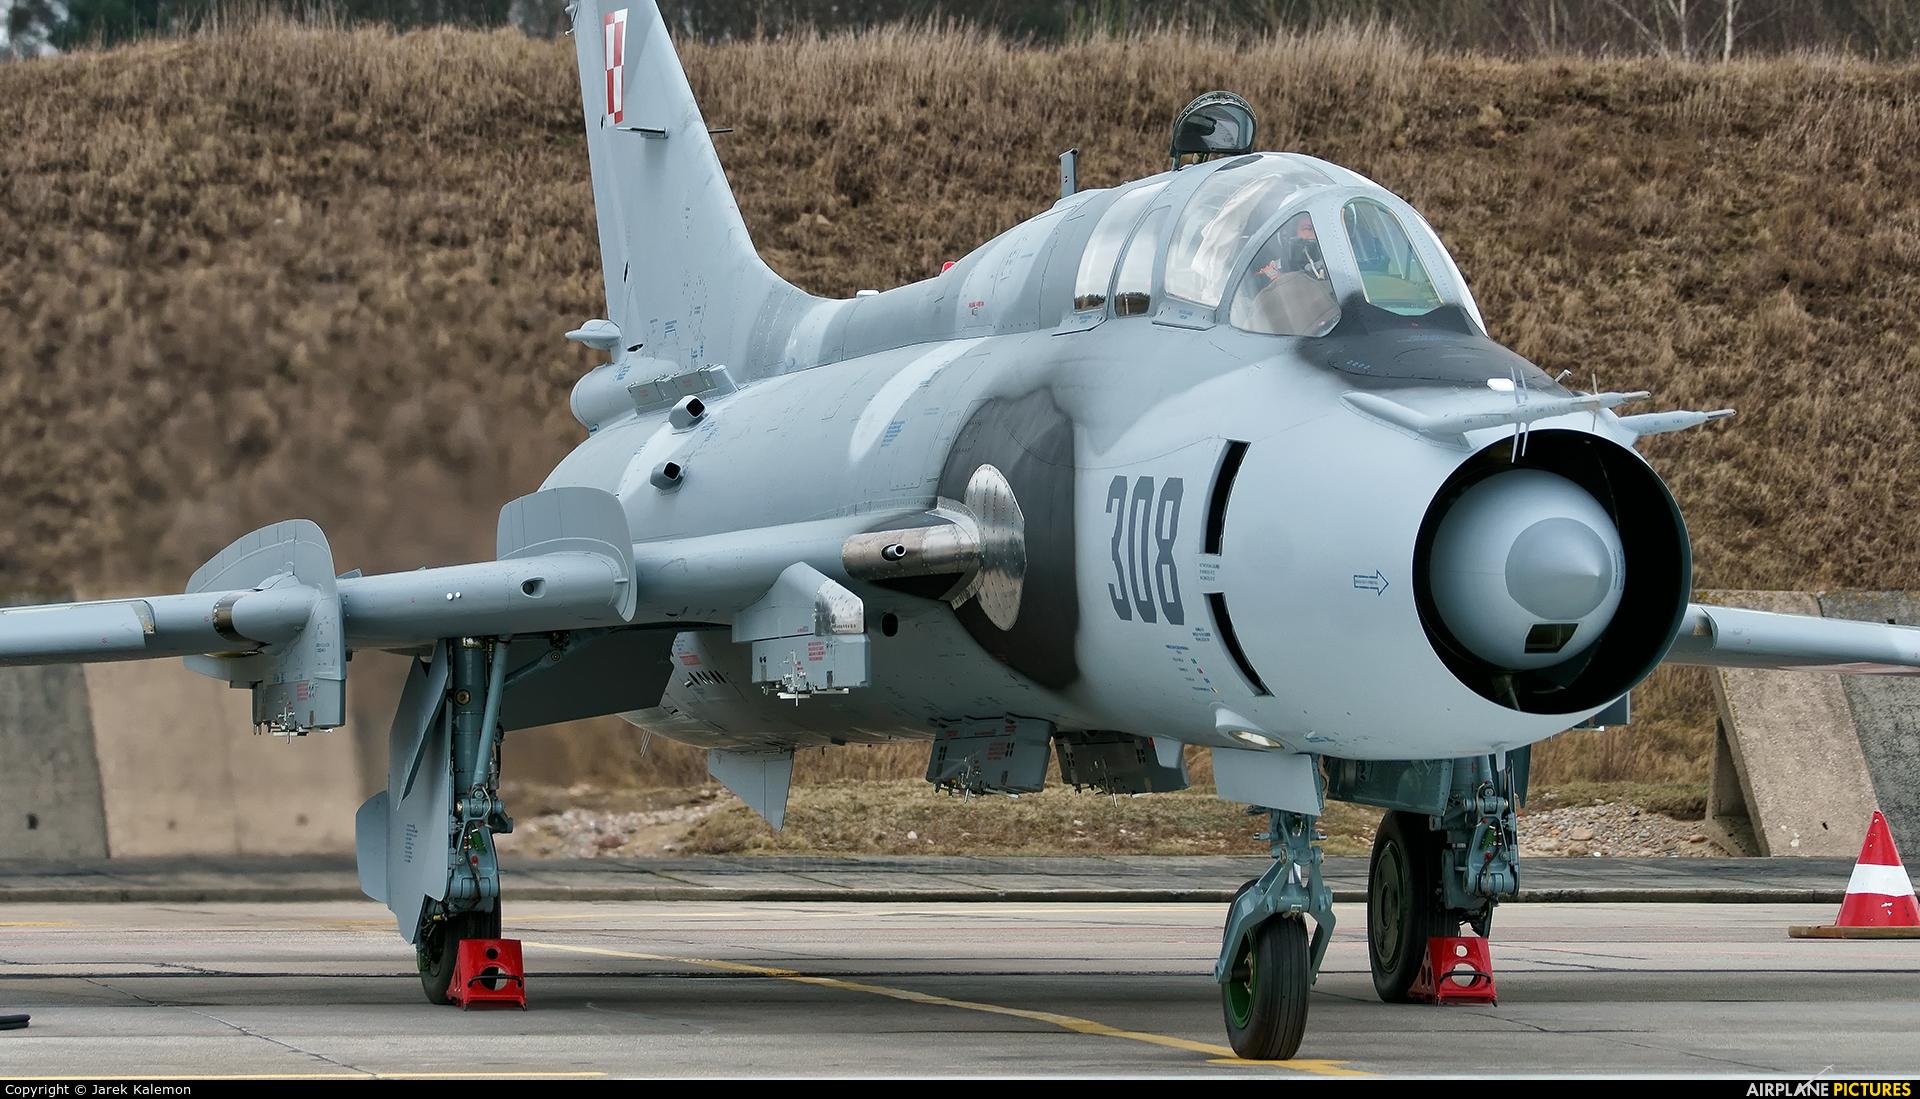 Poland - Air Force 308 aircraft at Świdwin